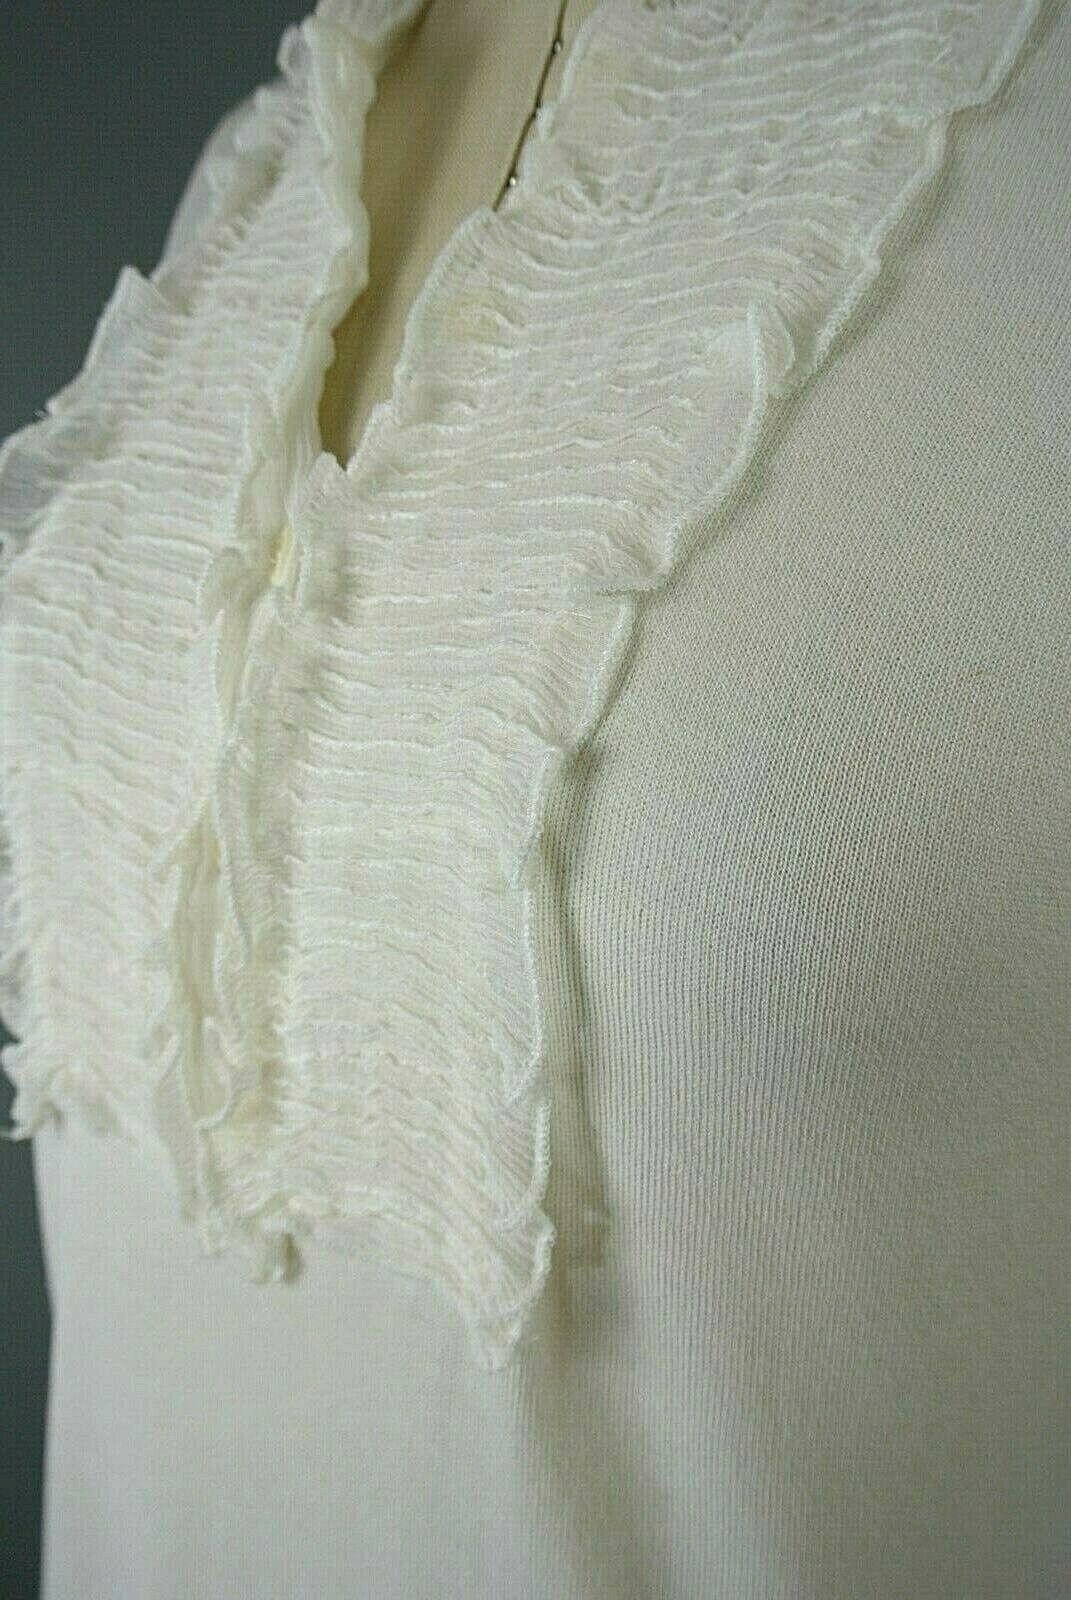 BCBG MAXAZRIA Silk/Cotton Blouse M Ivory Ruffle S… - image 4